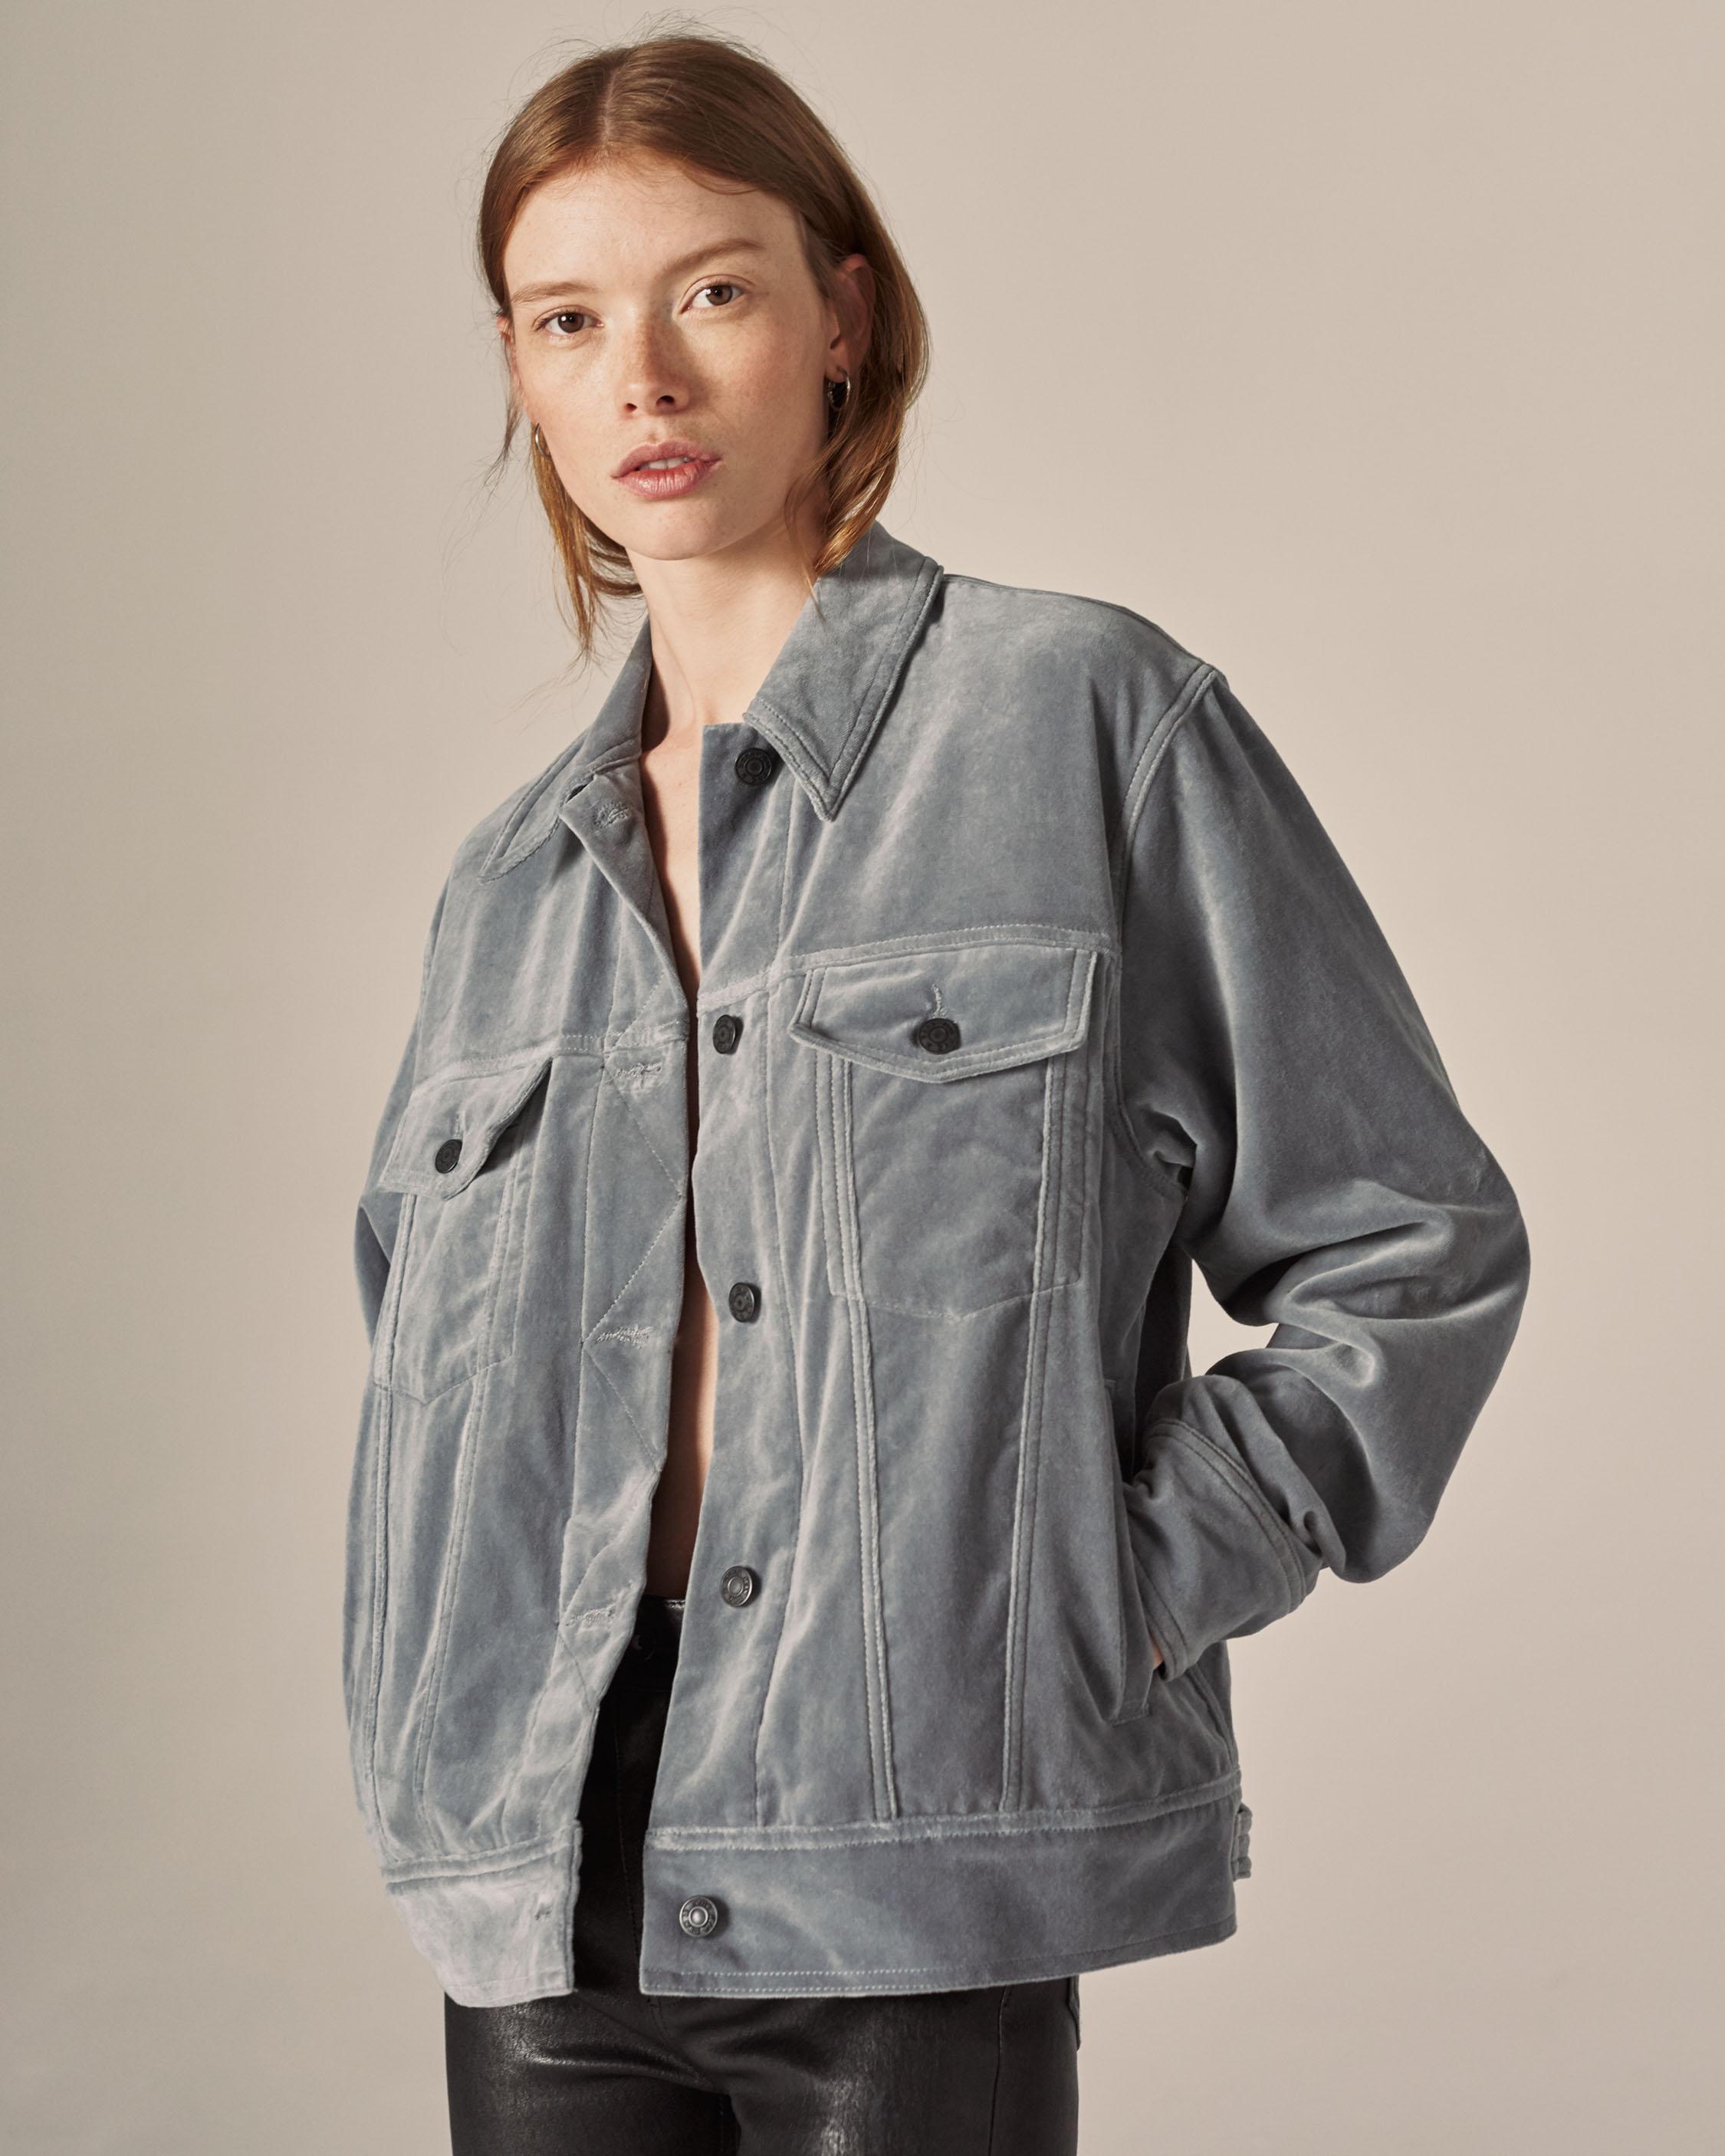 473a2691a71e Oversized Jacket